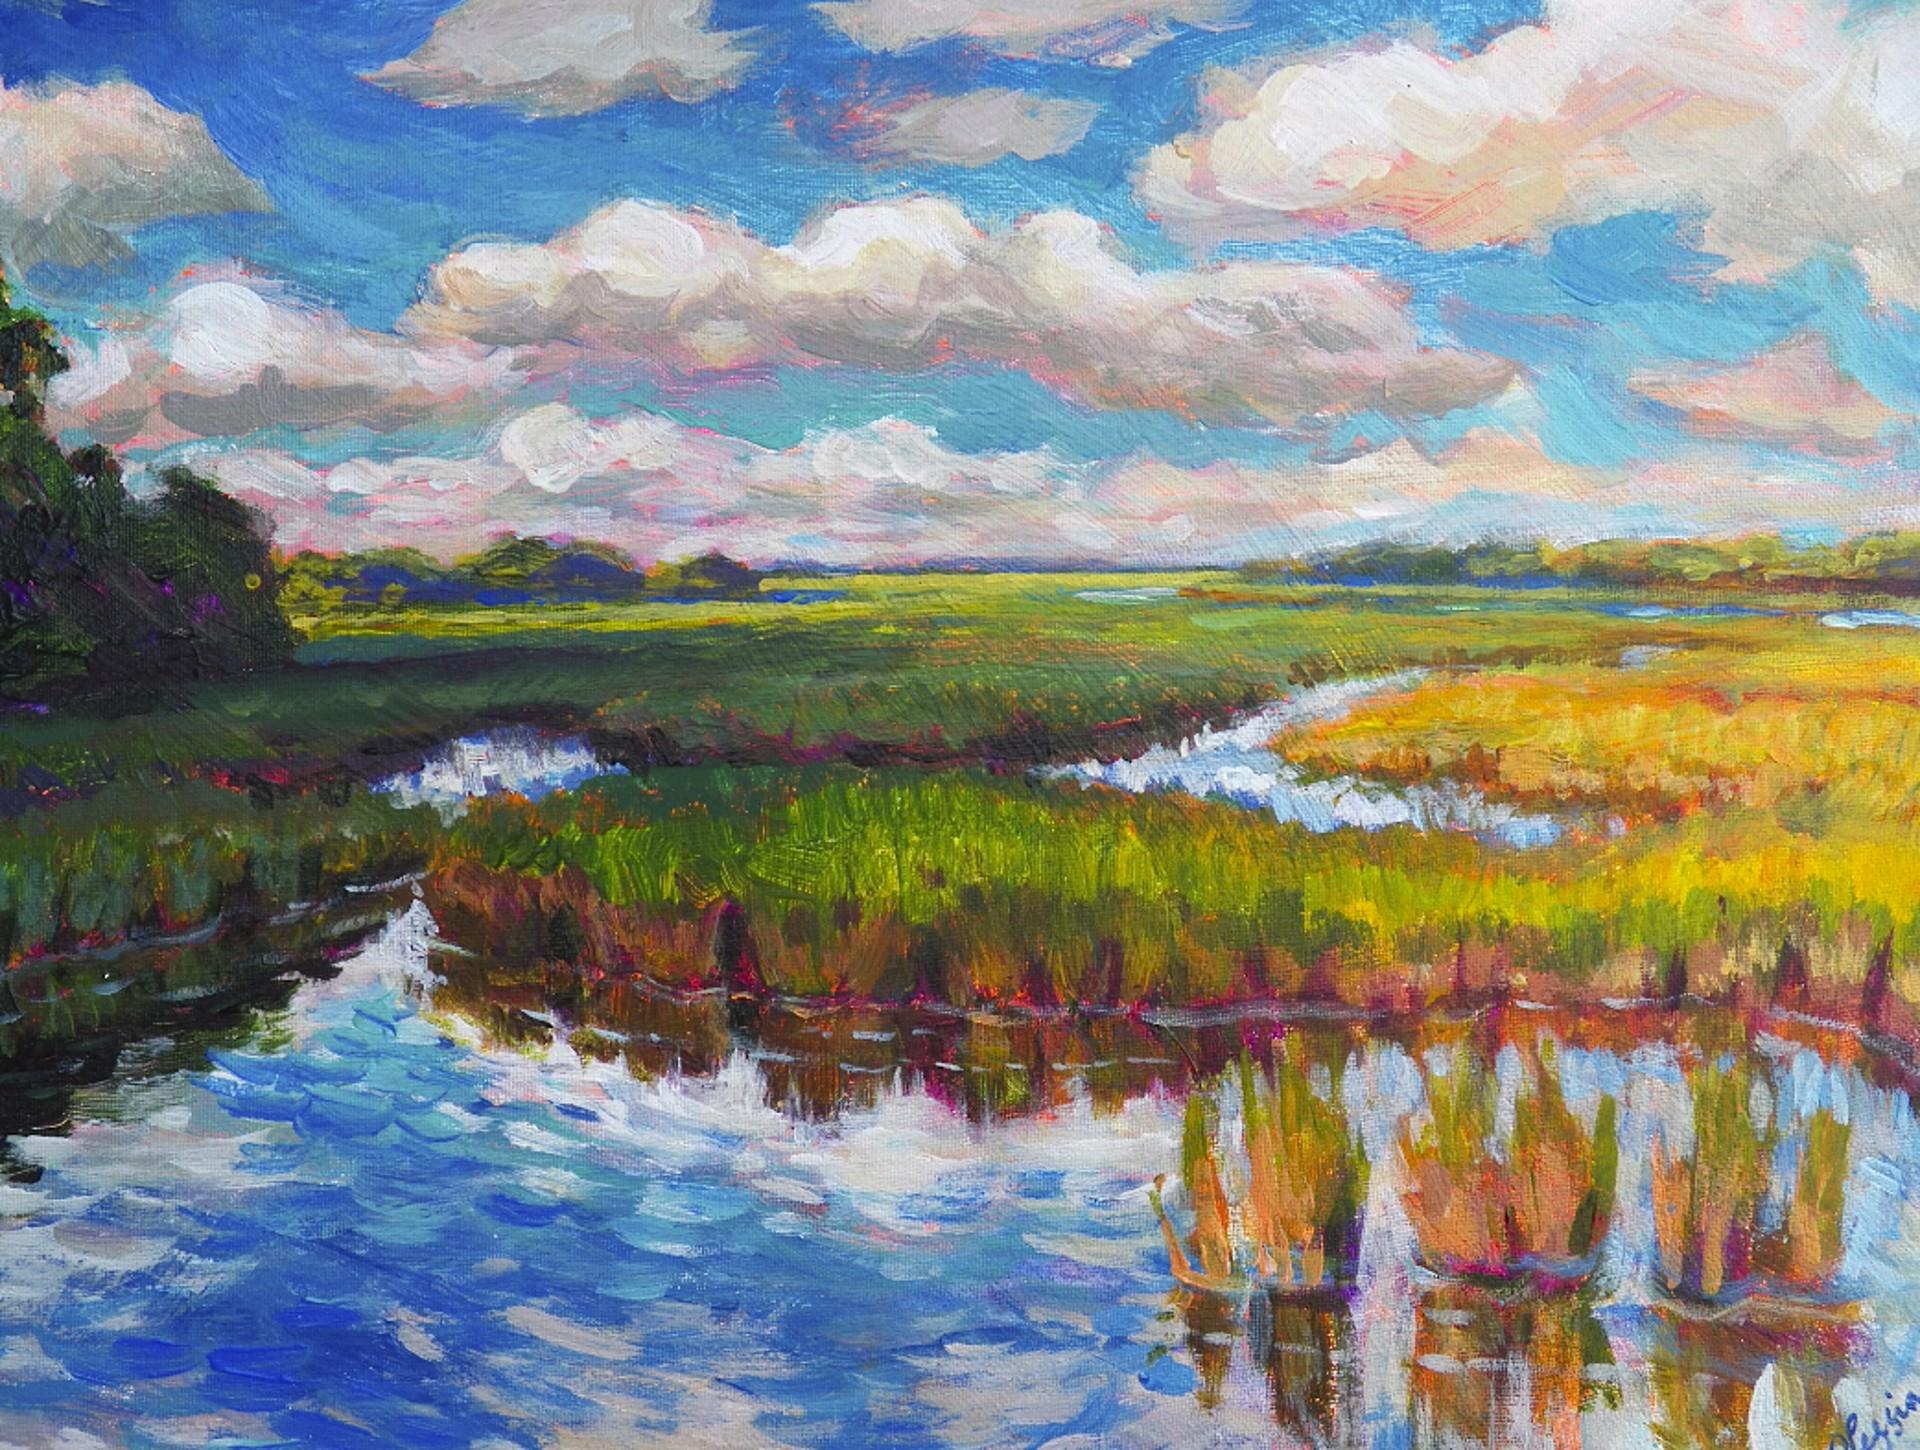 Secret Marsh by Olessia Maximenko